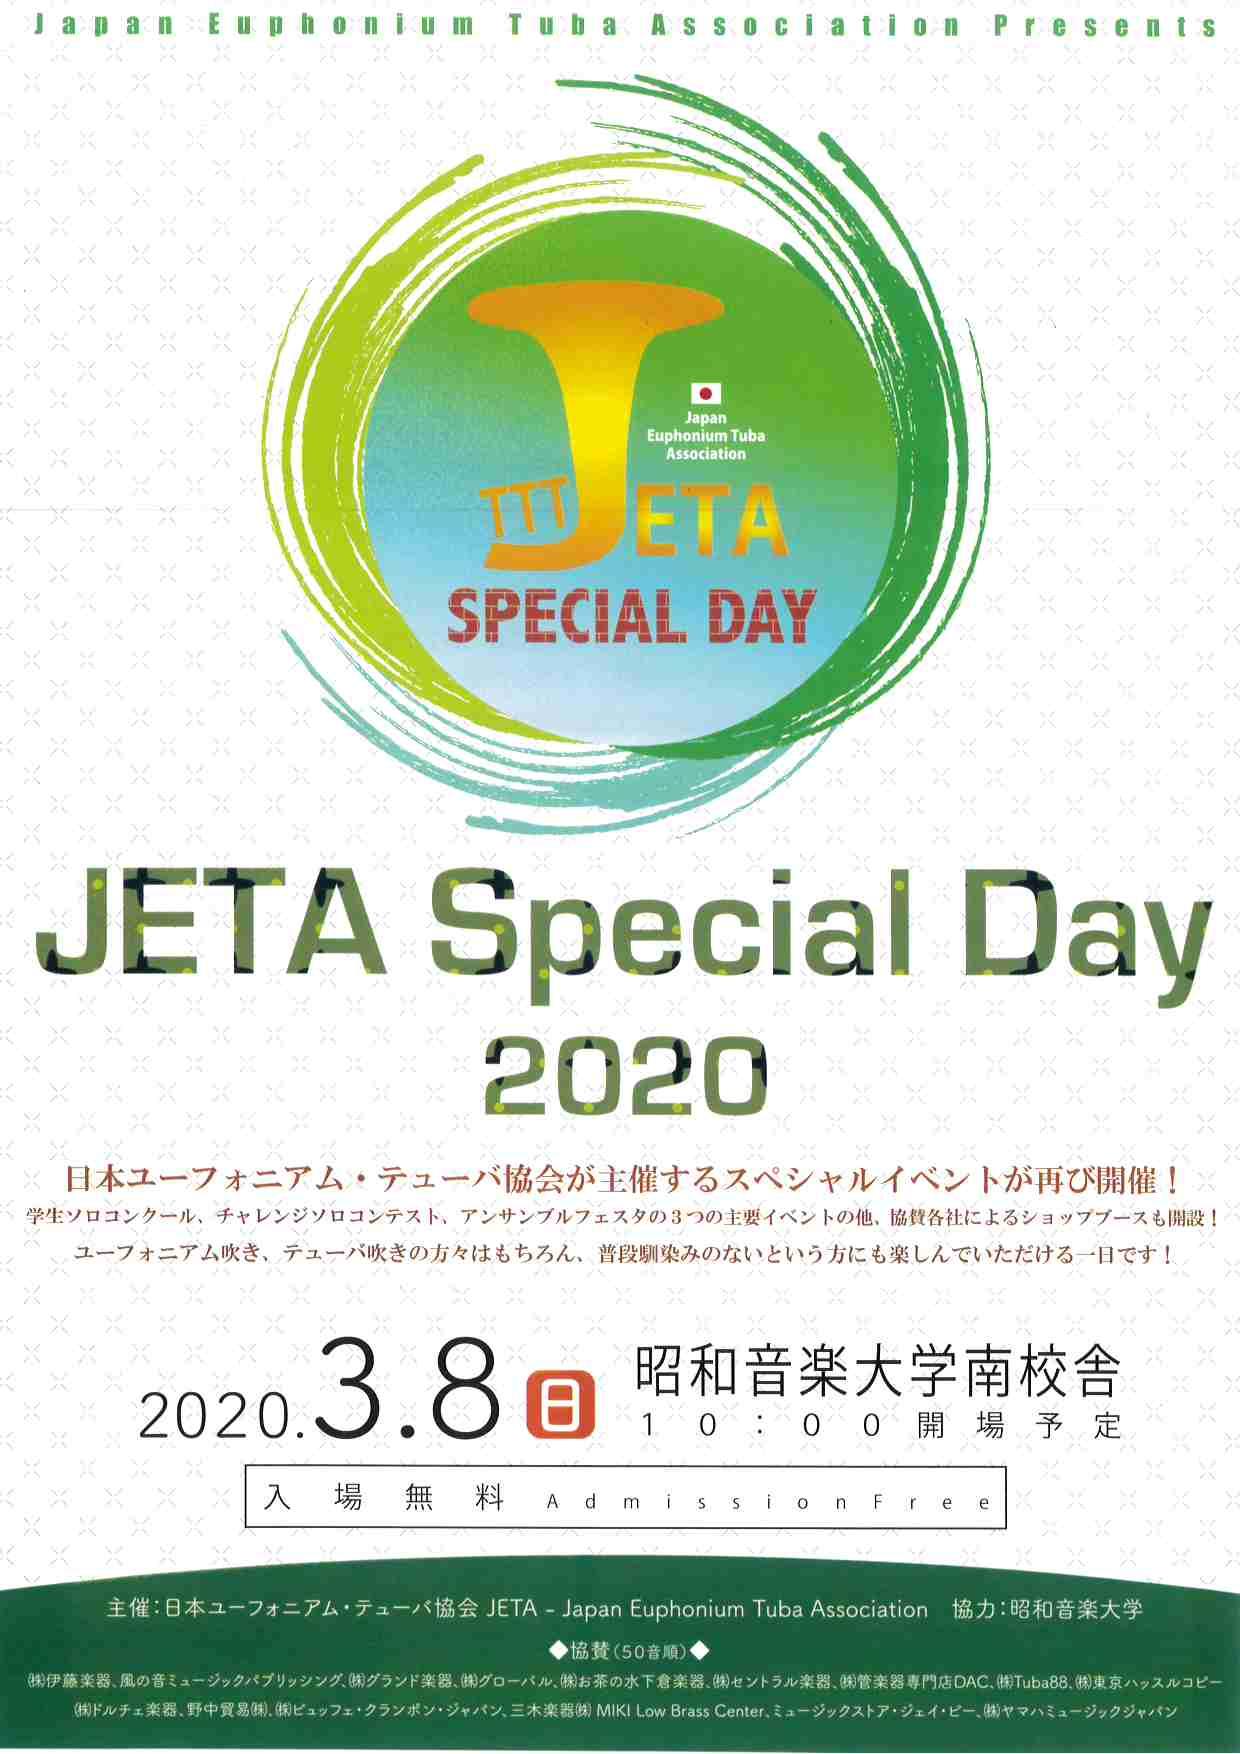 JETA Spesial Day 2020